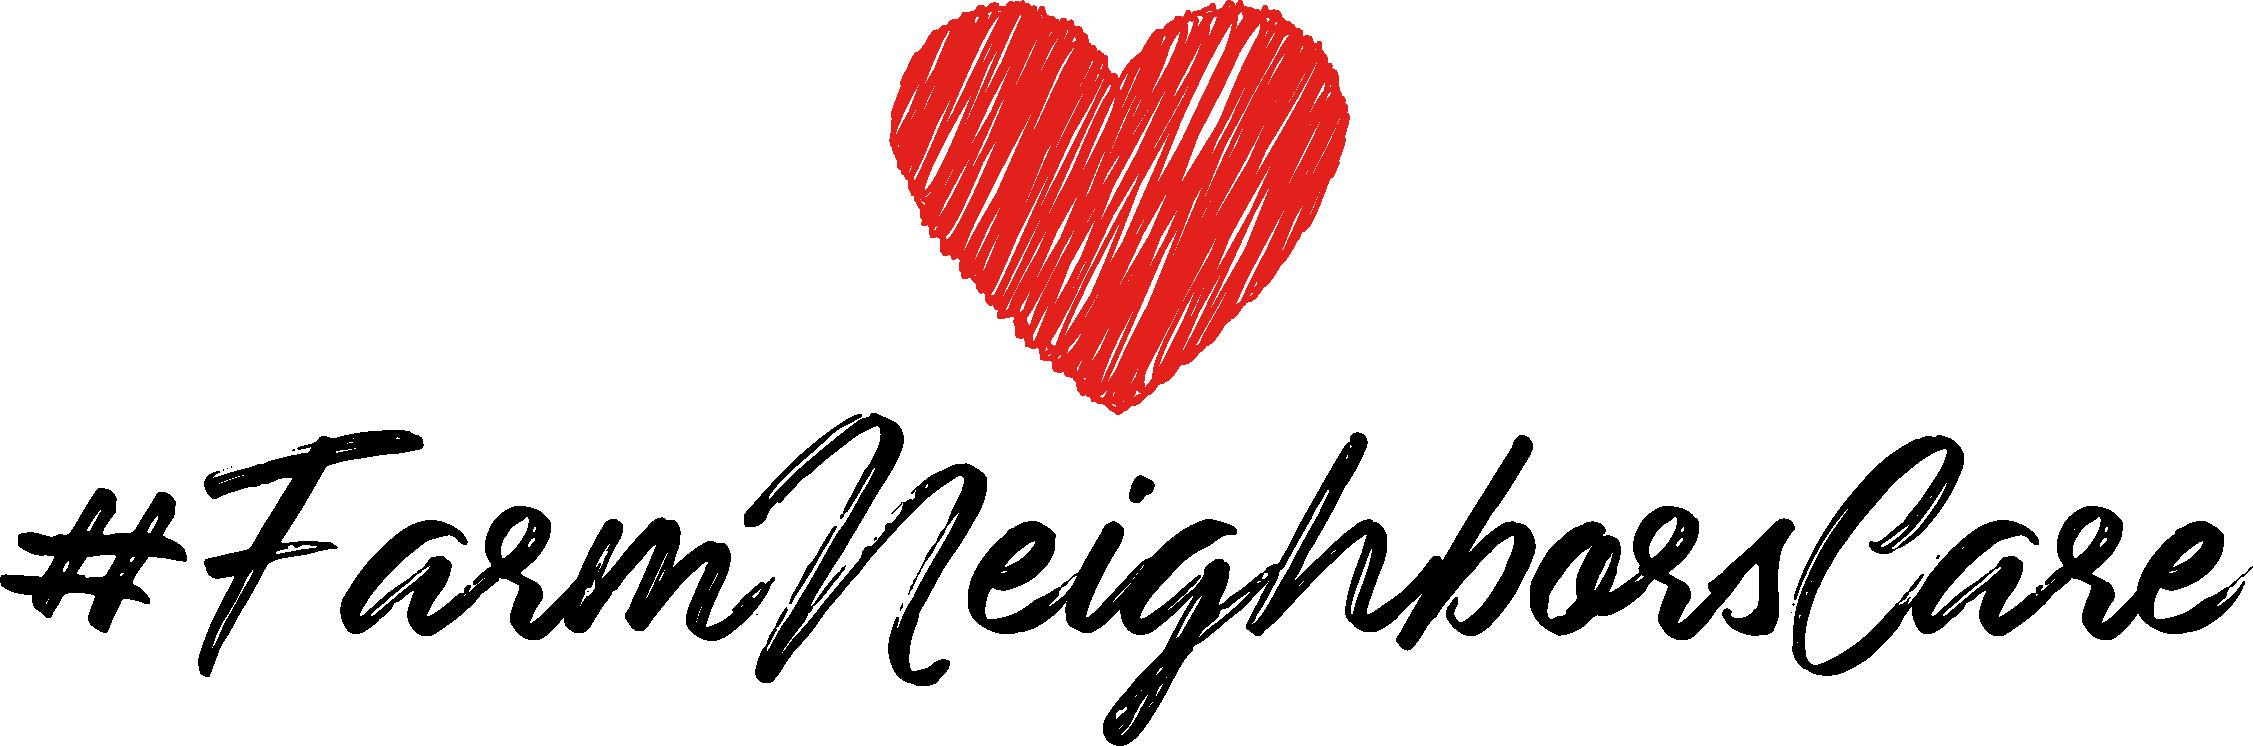 farm_neighbors_care_logo